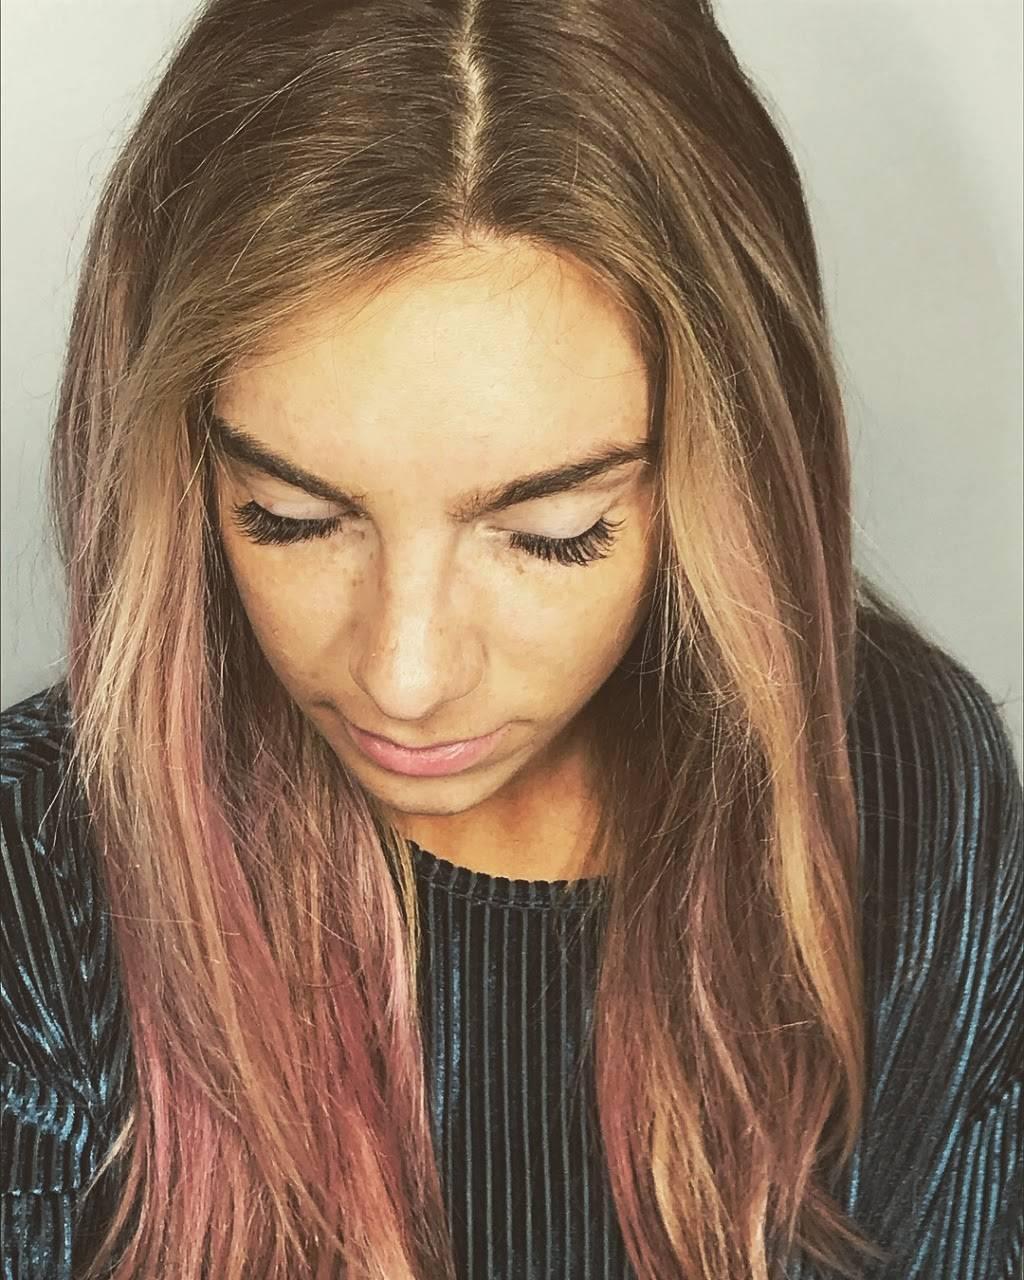 Beauty By Dianna (@ Salon Lofts Largo) - hair care  | Photo 1 of 10 | Address: Loft 8, 10500 Ulmerton Rd Unit 816, Largo, FL 33770, USA | Phone: (305) 395-9005